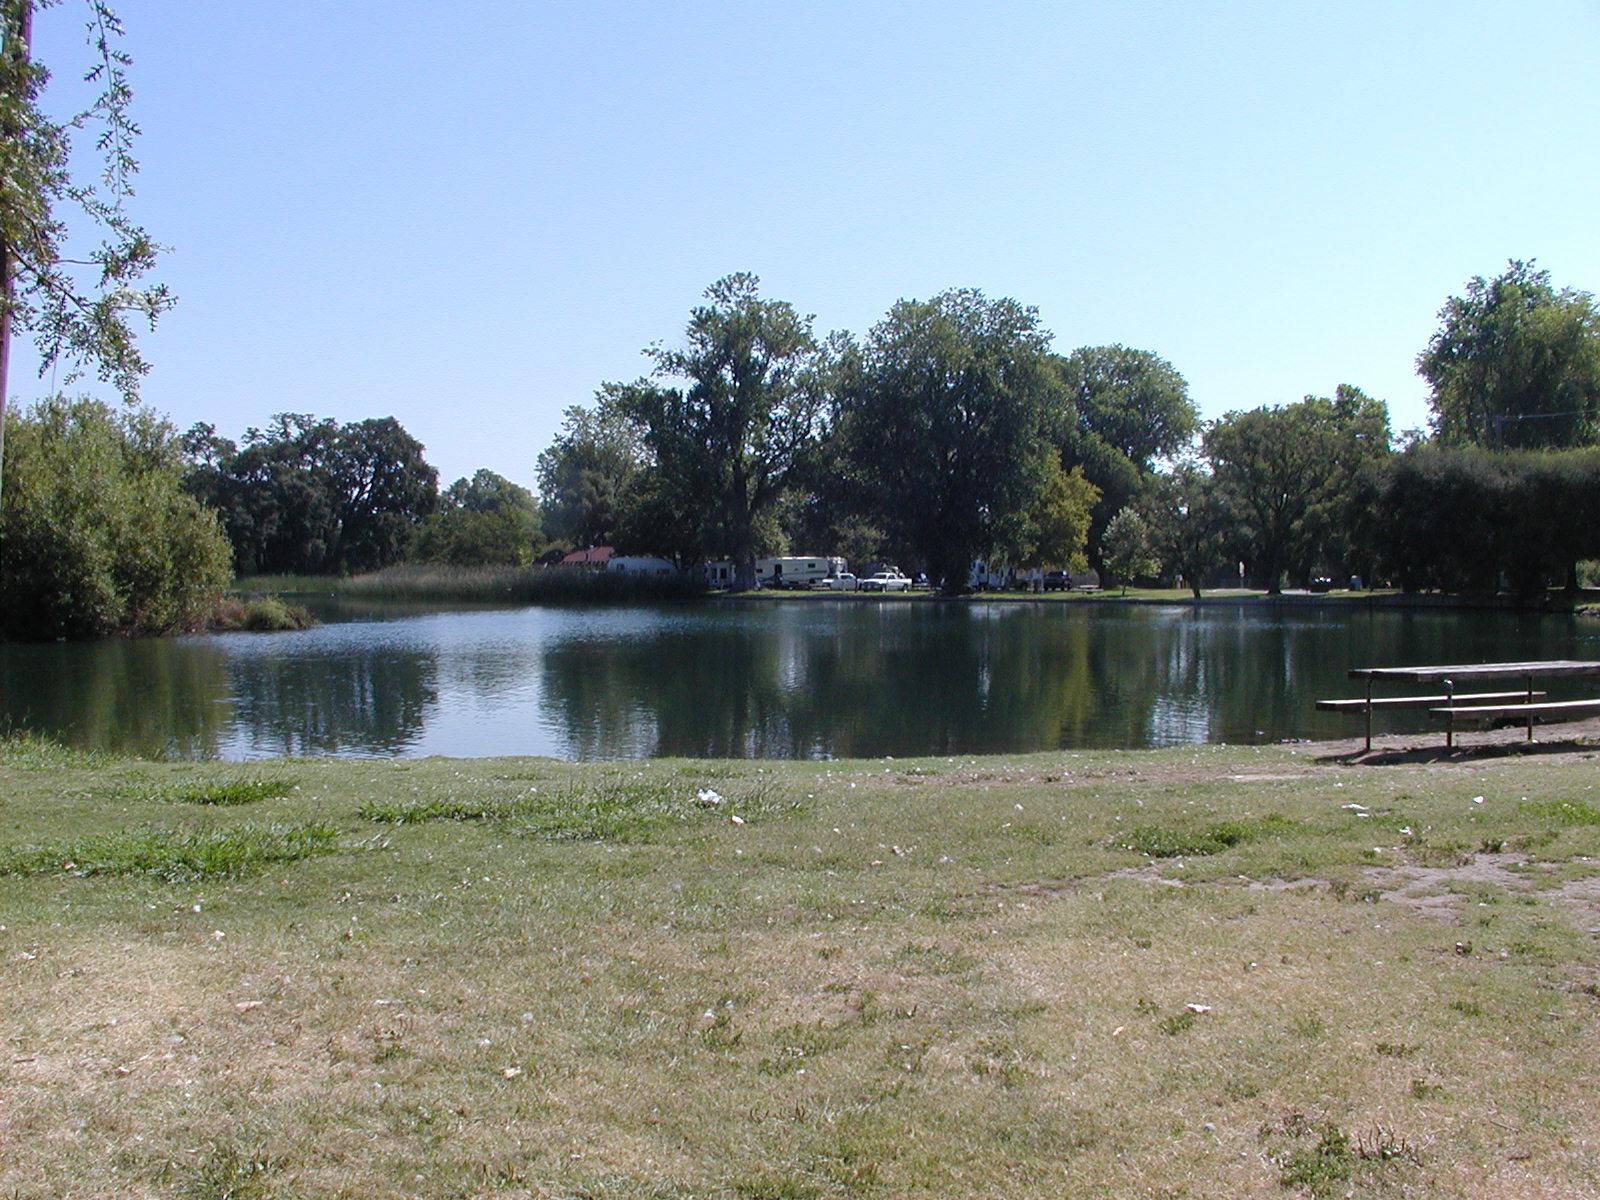 Click image for larger version  Name:Lodi Lake 011.jpg Views:92 Size:439.4 KB ID:65819